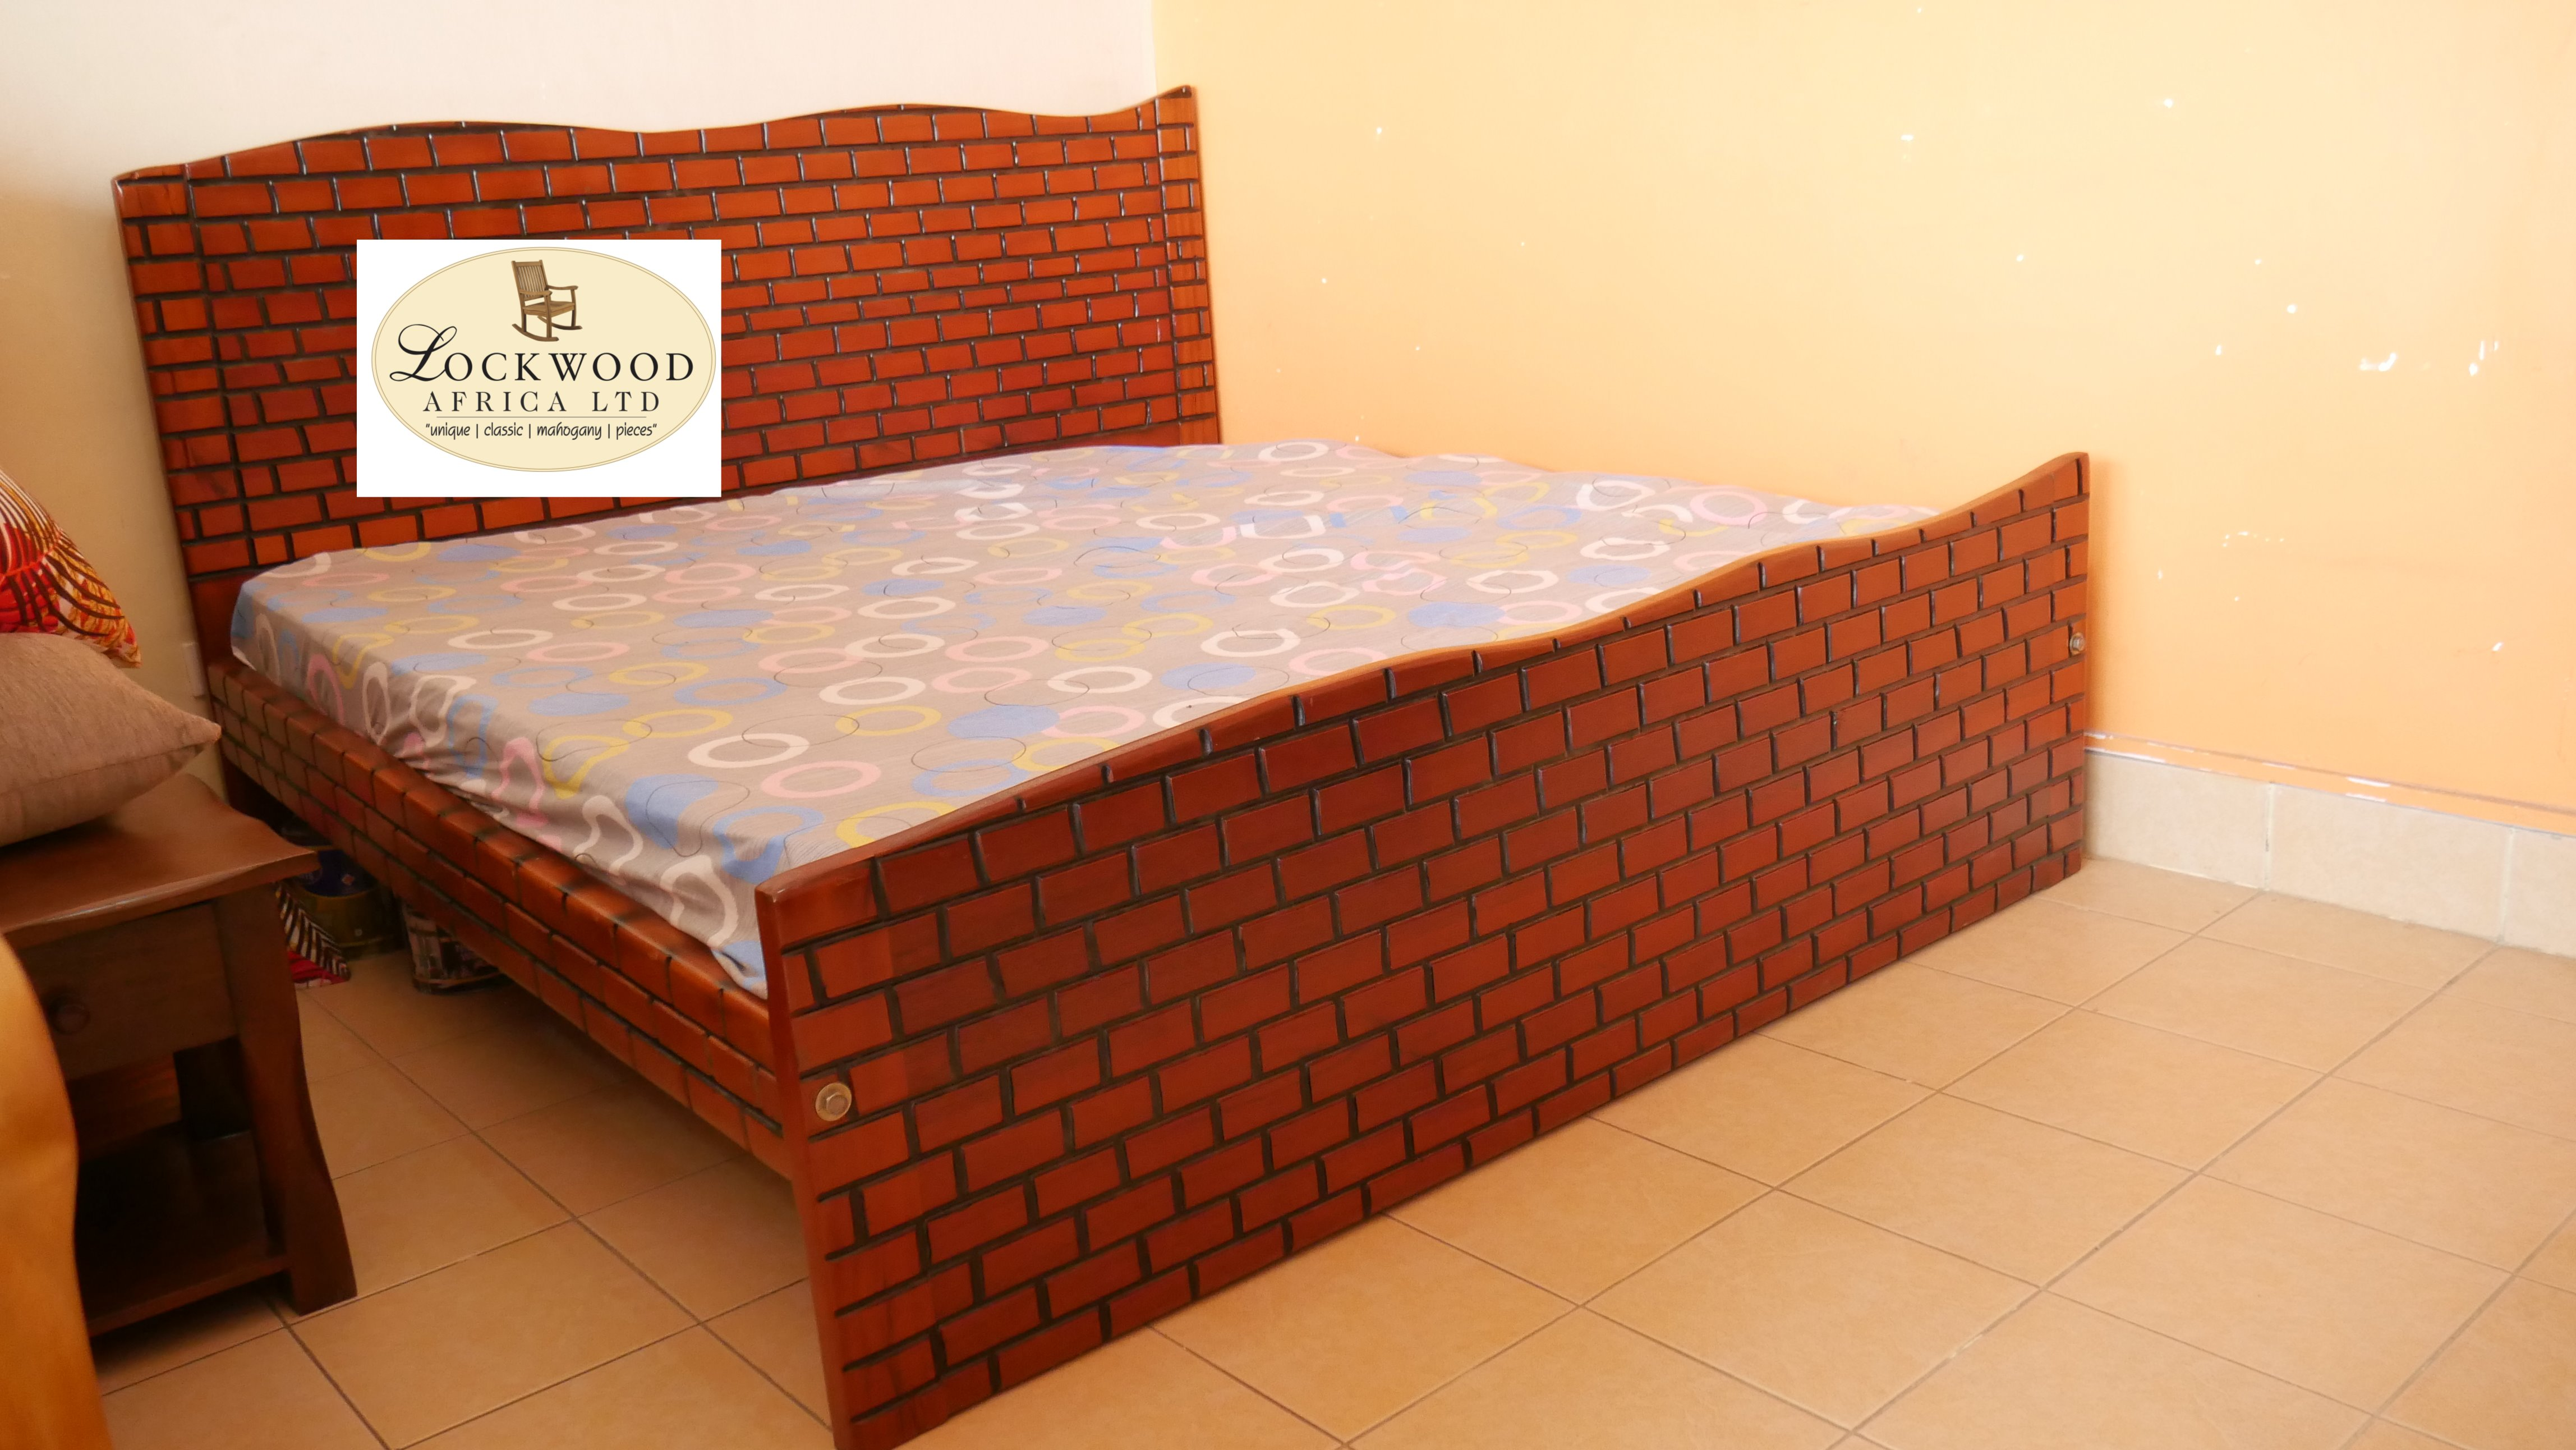 6 X 6 Bed